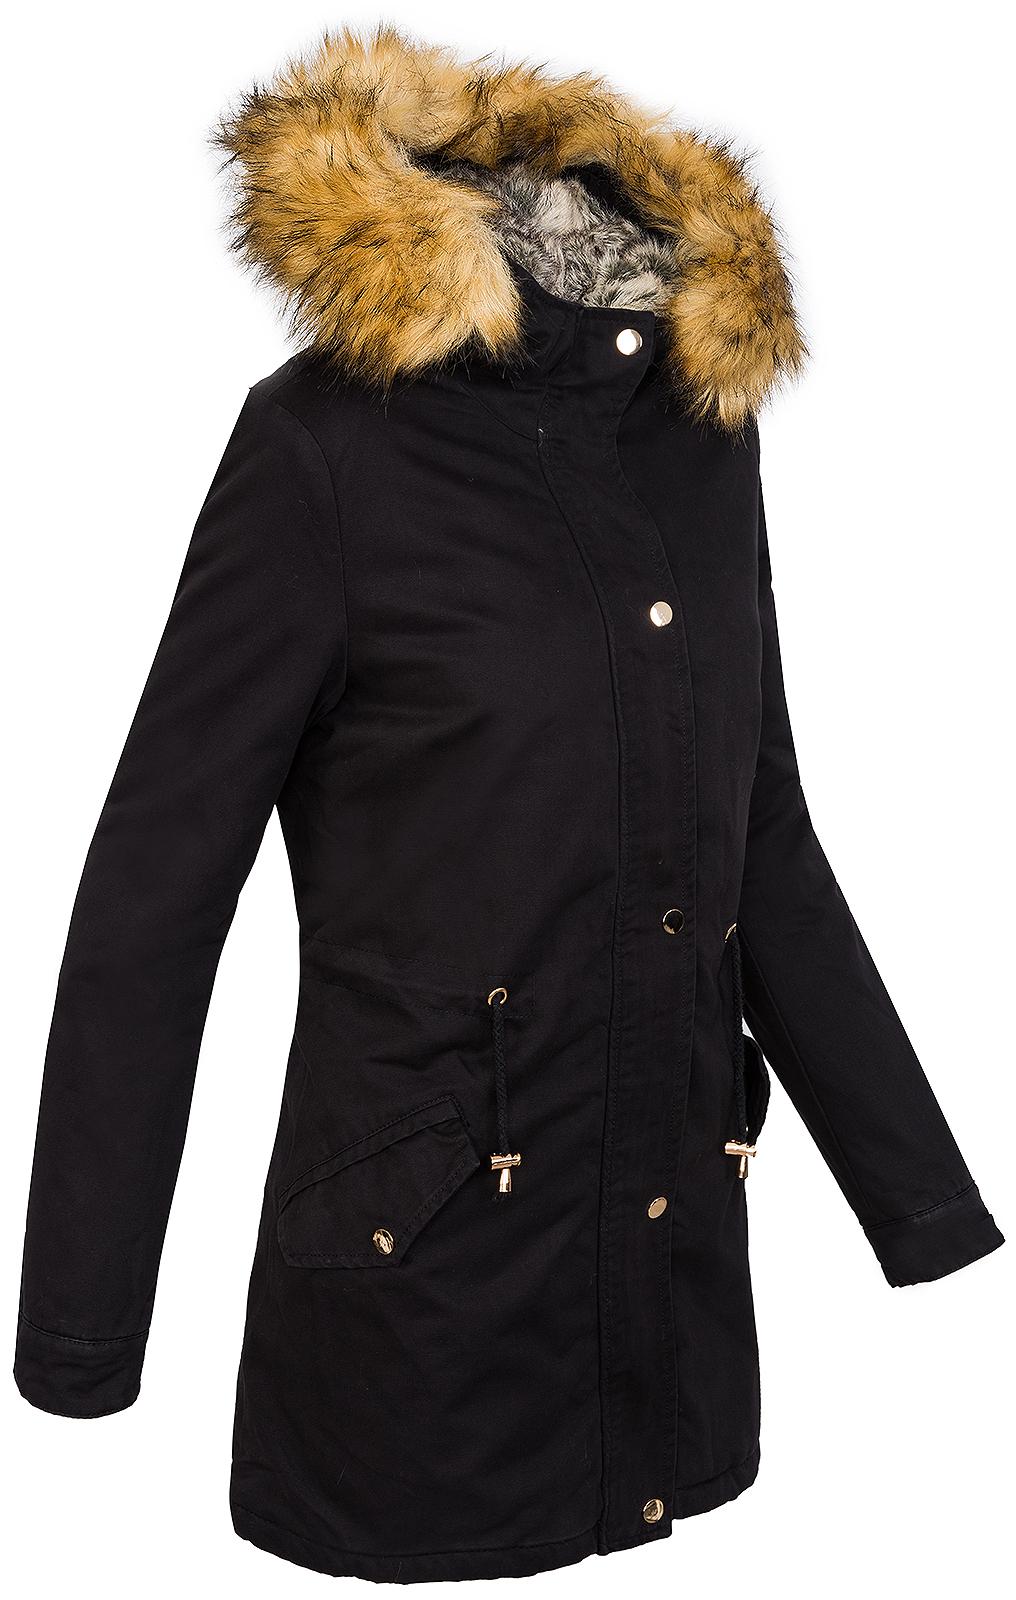 winter parka damen jacke mantel damenjacke kapuze mit kunstfell warm d 208 ebay. Black Bedroom Furniture Sets. Home Design Ideas